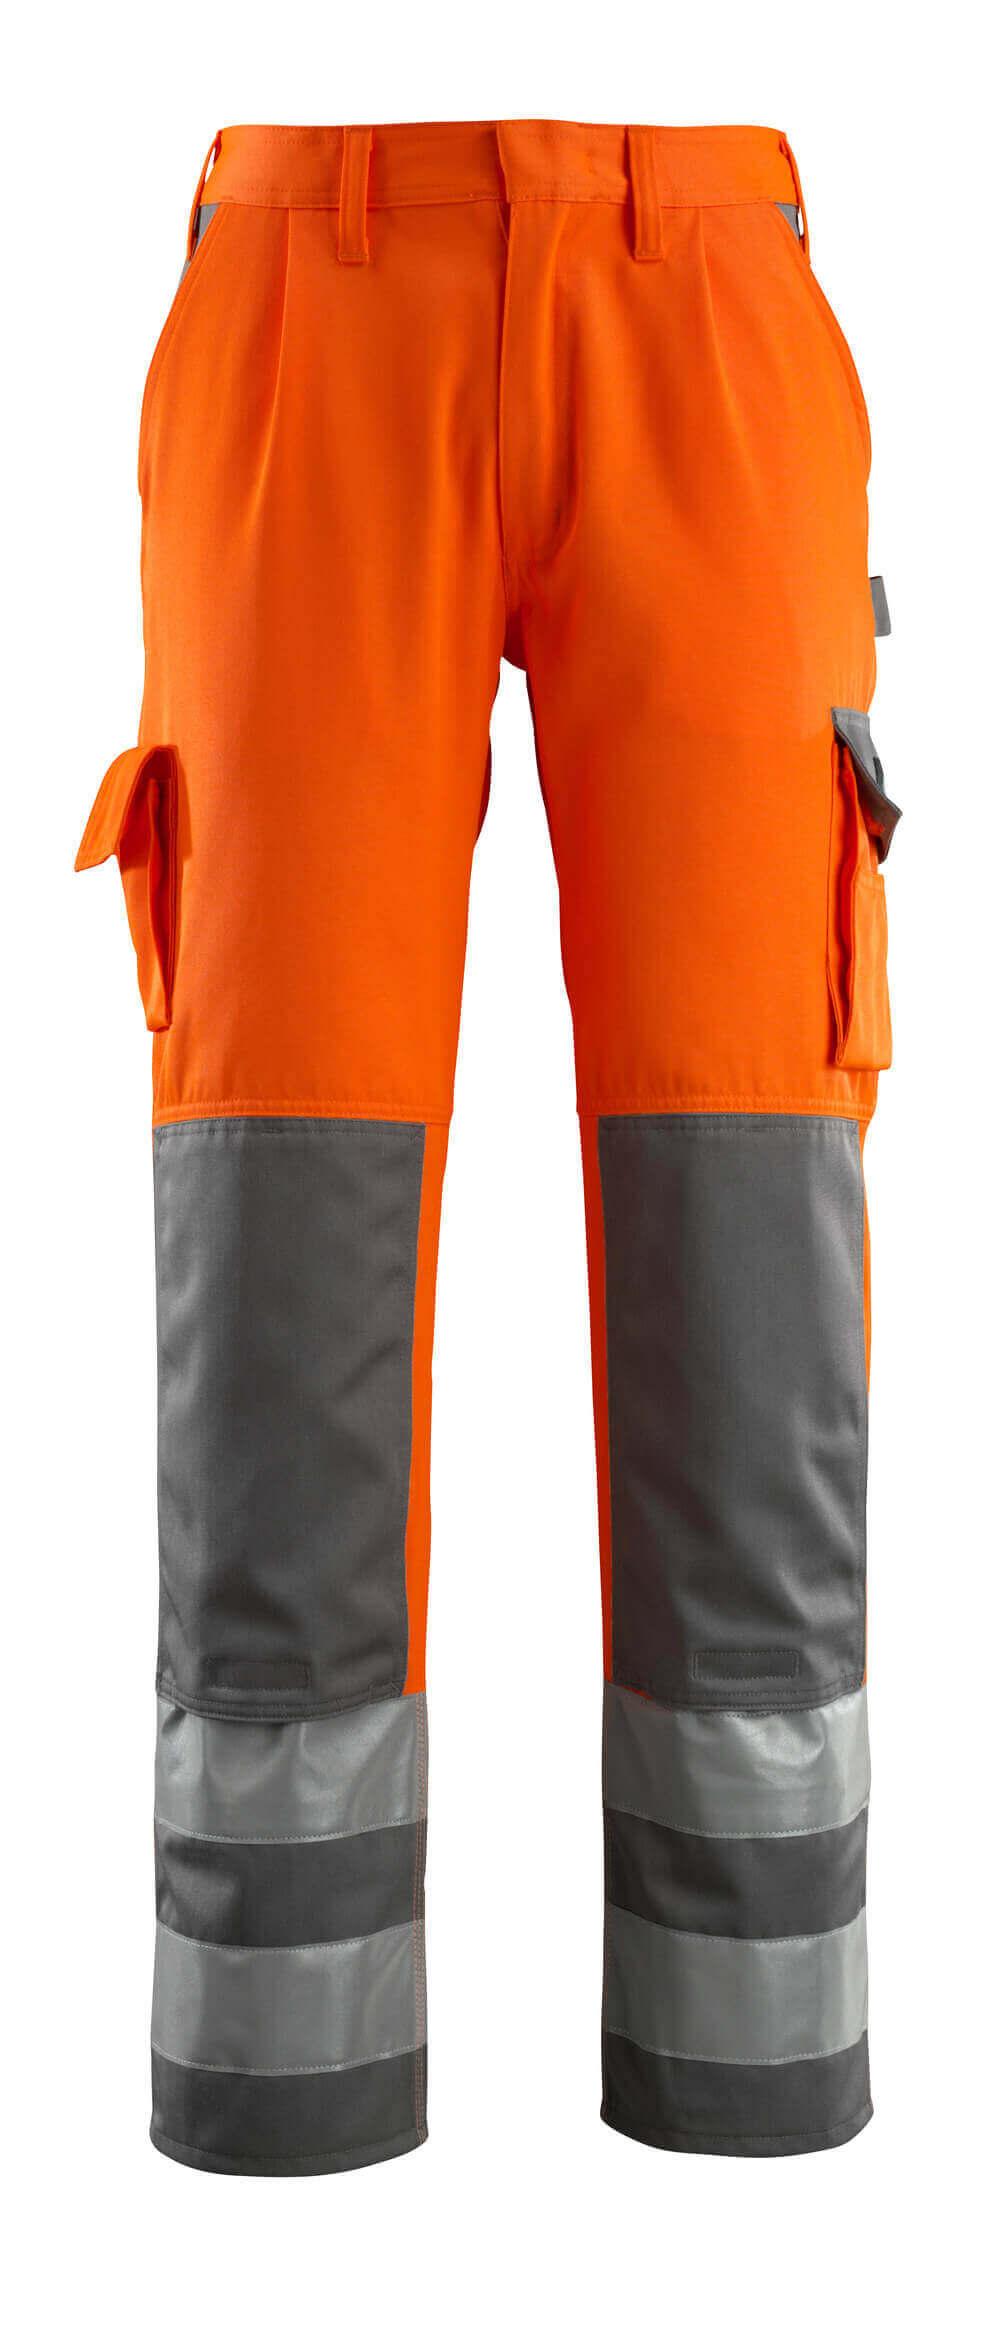 Pantalon renfort genoux Classe 2